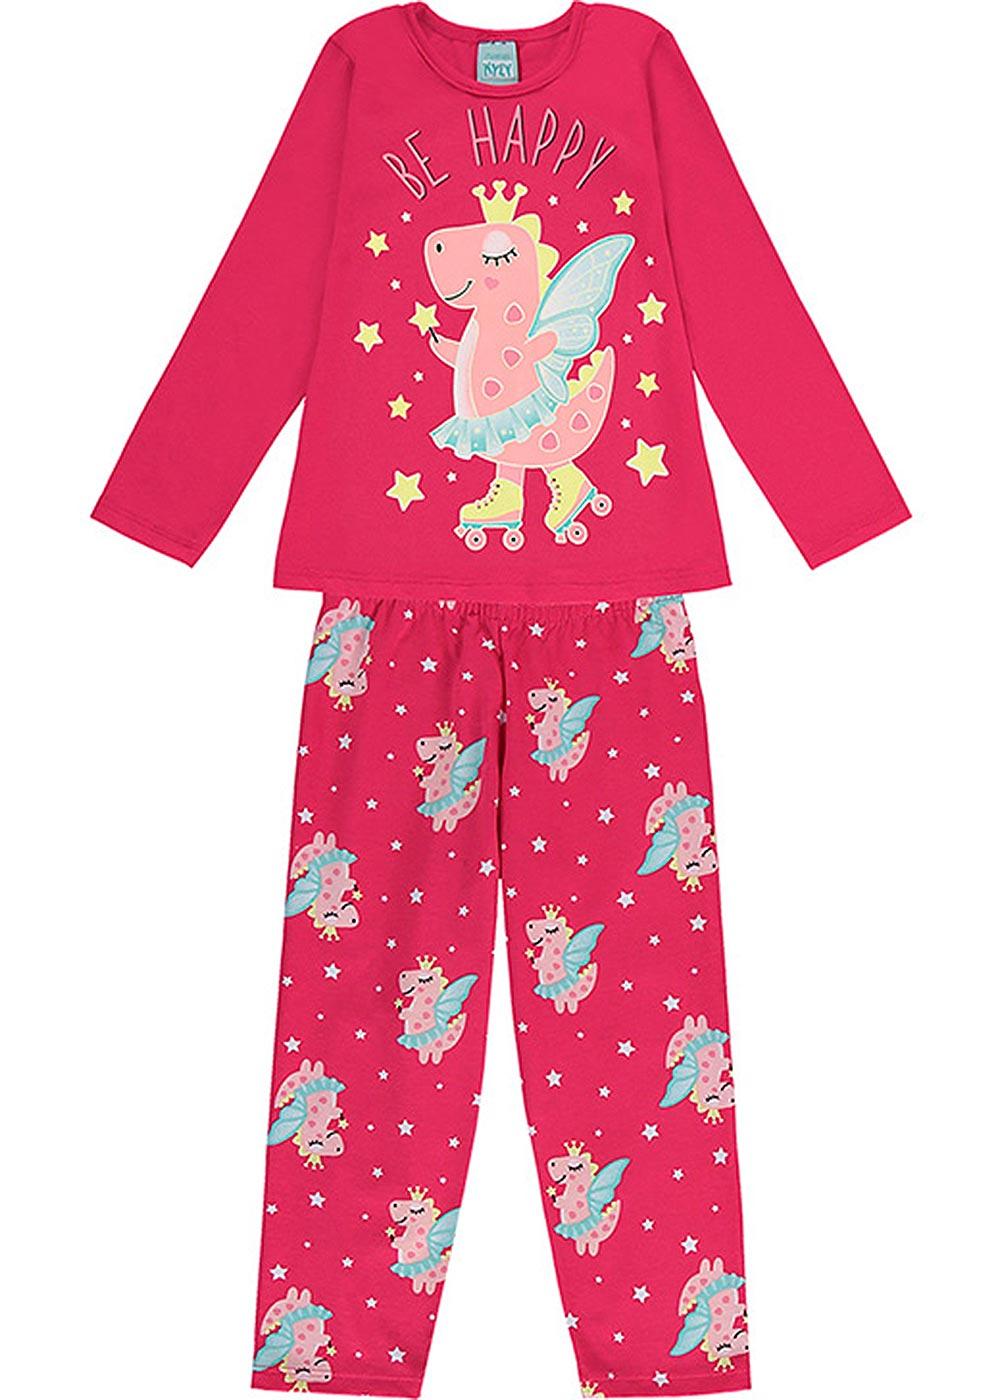 Pijama Infantil Feminino Inverno Rosa Be Happy - Kyly